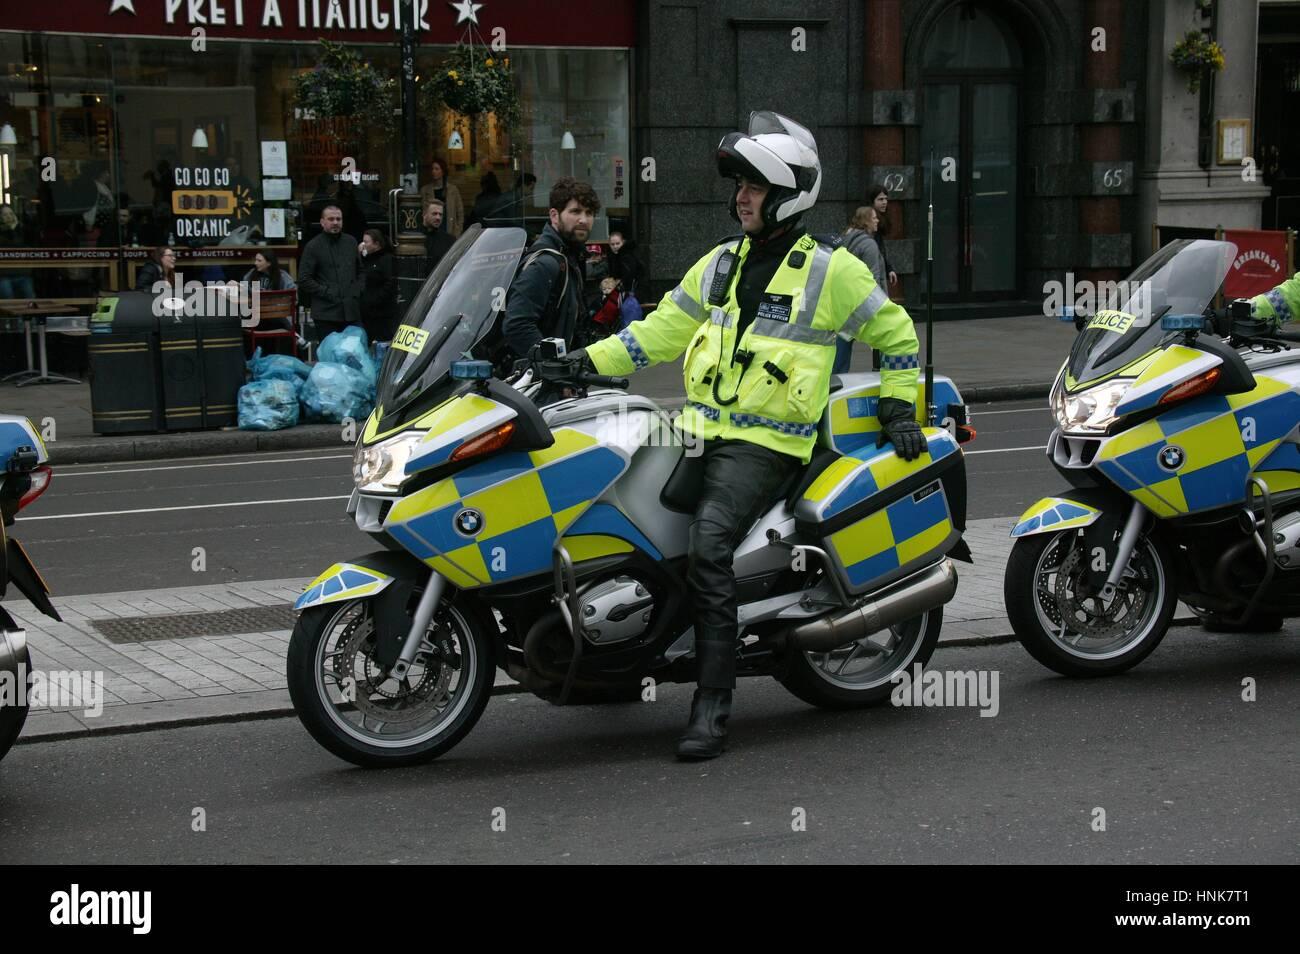 Police Motocycle Stock Photo